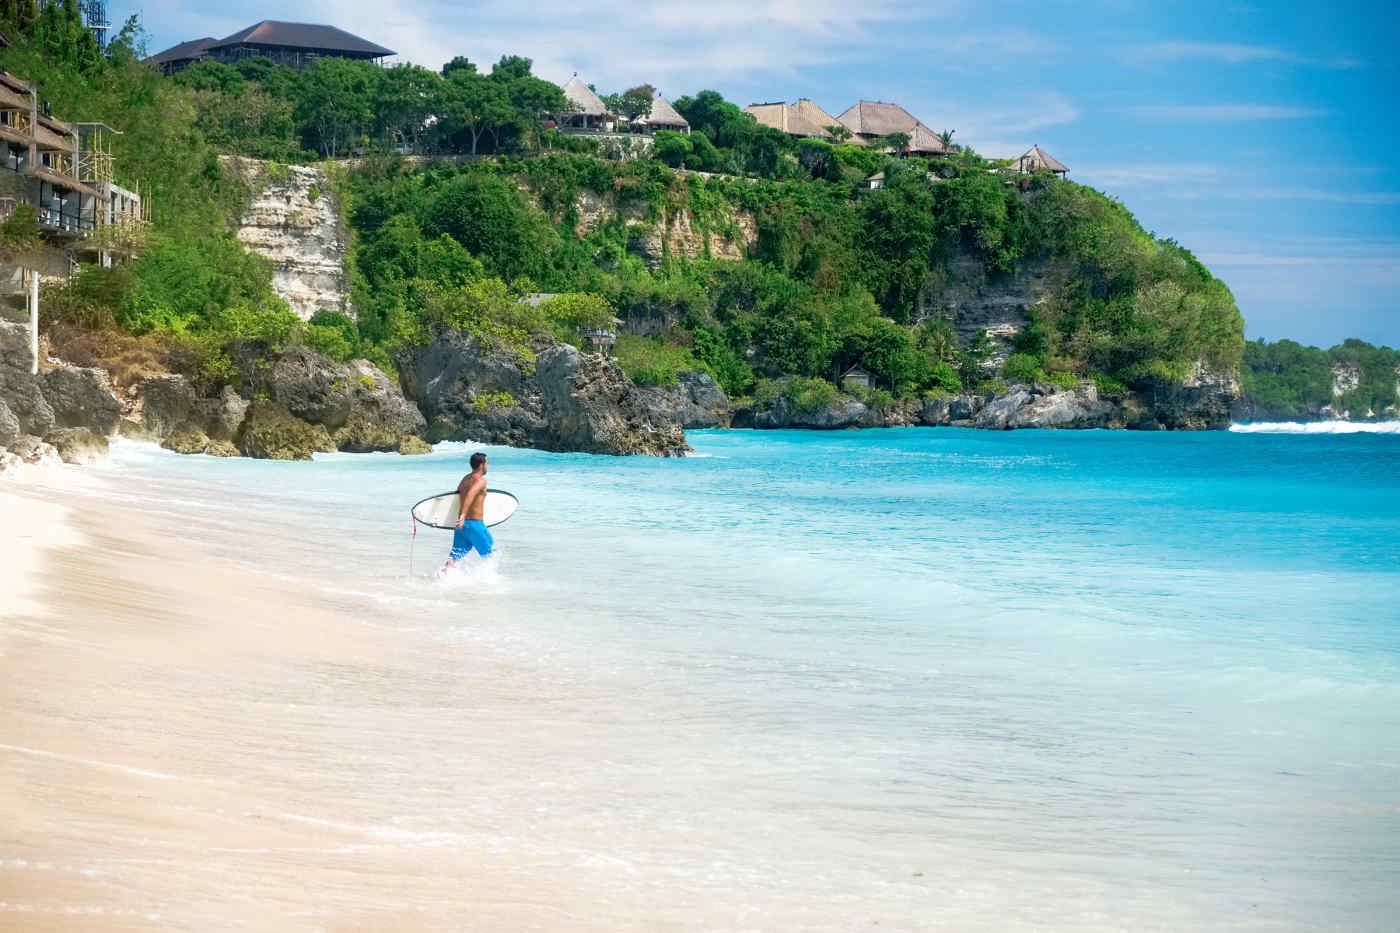 Beach near Tanjung Benoa, Bali